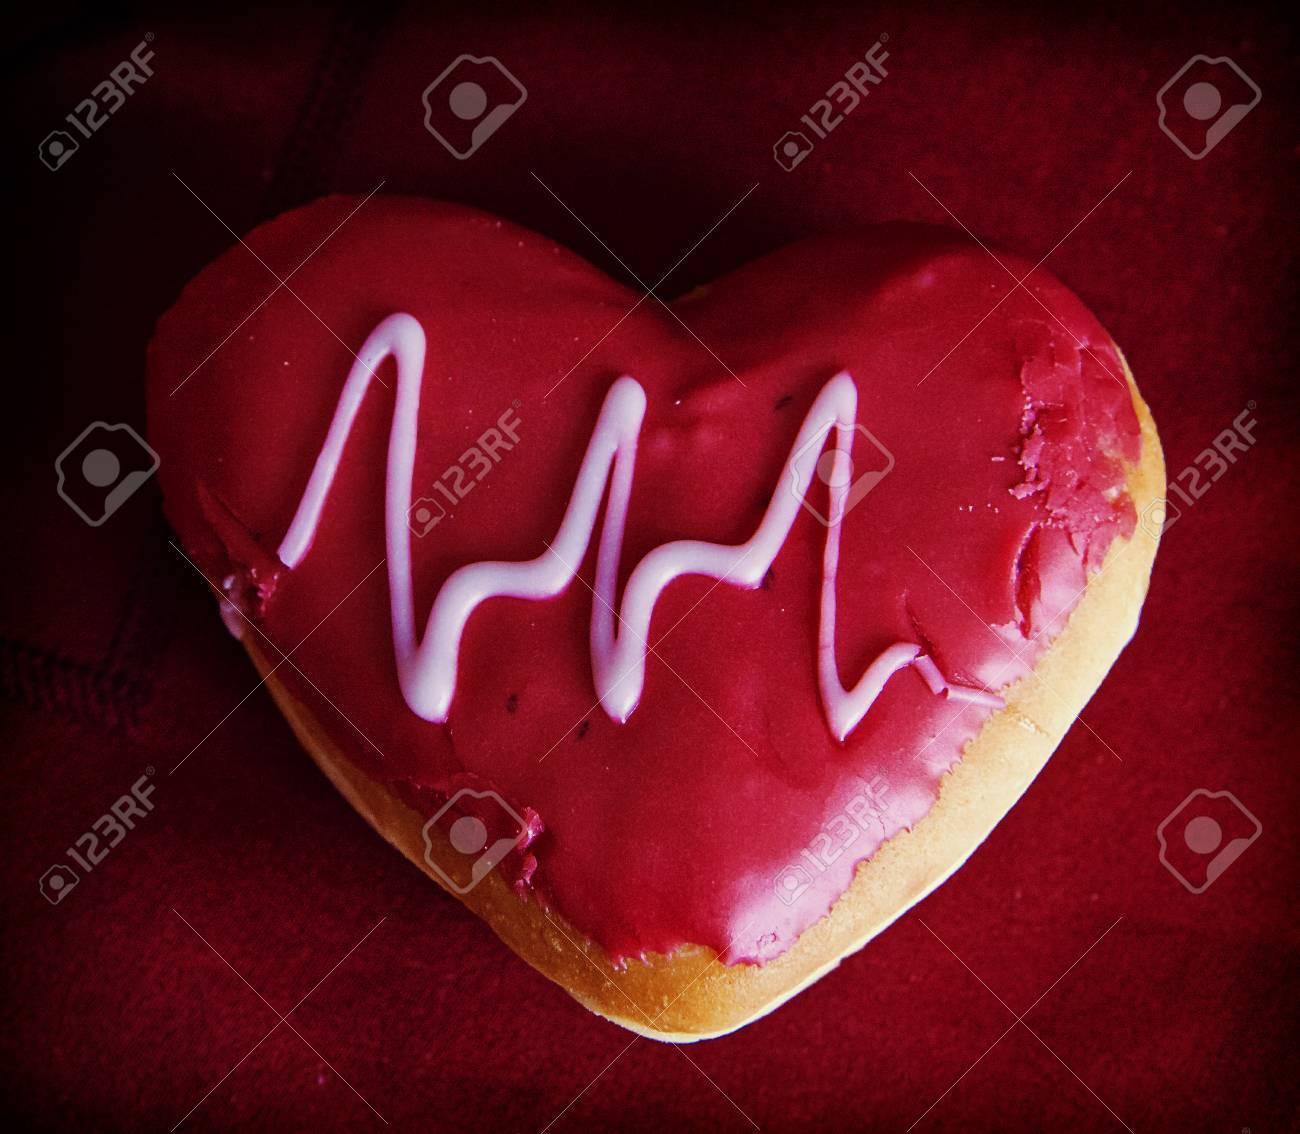 Doughnut heart shaped with glazed electrocardiogram decoration Stock Photo - 72550286